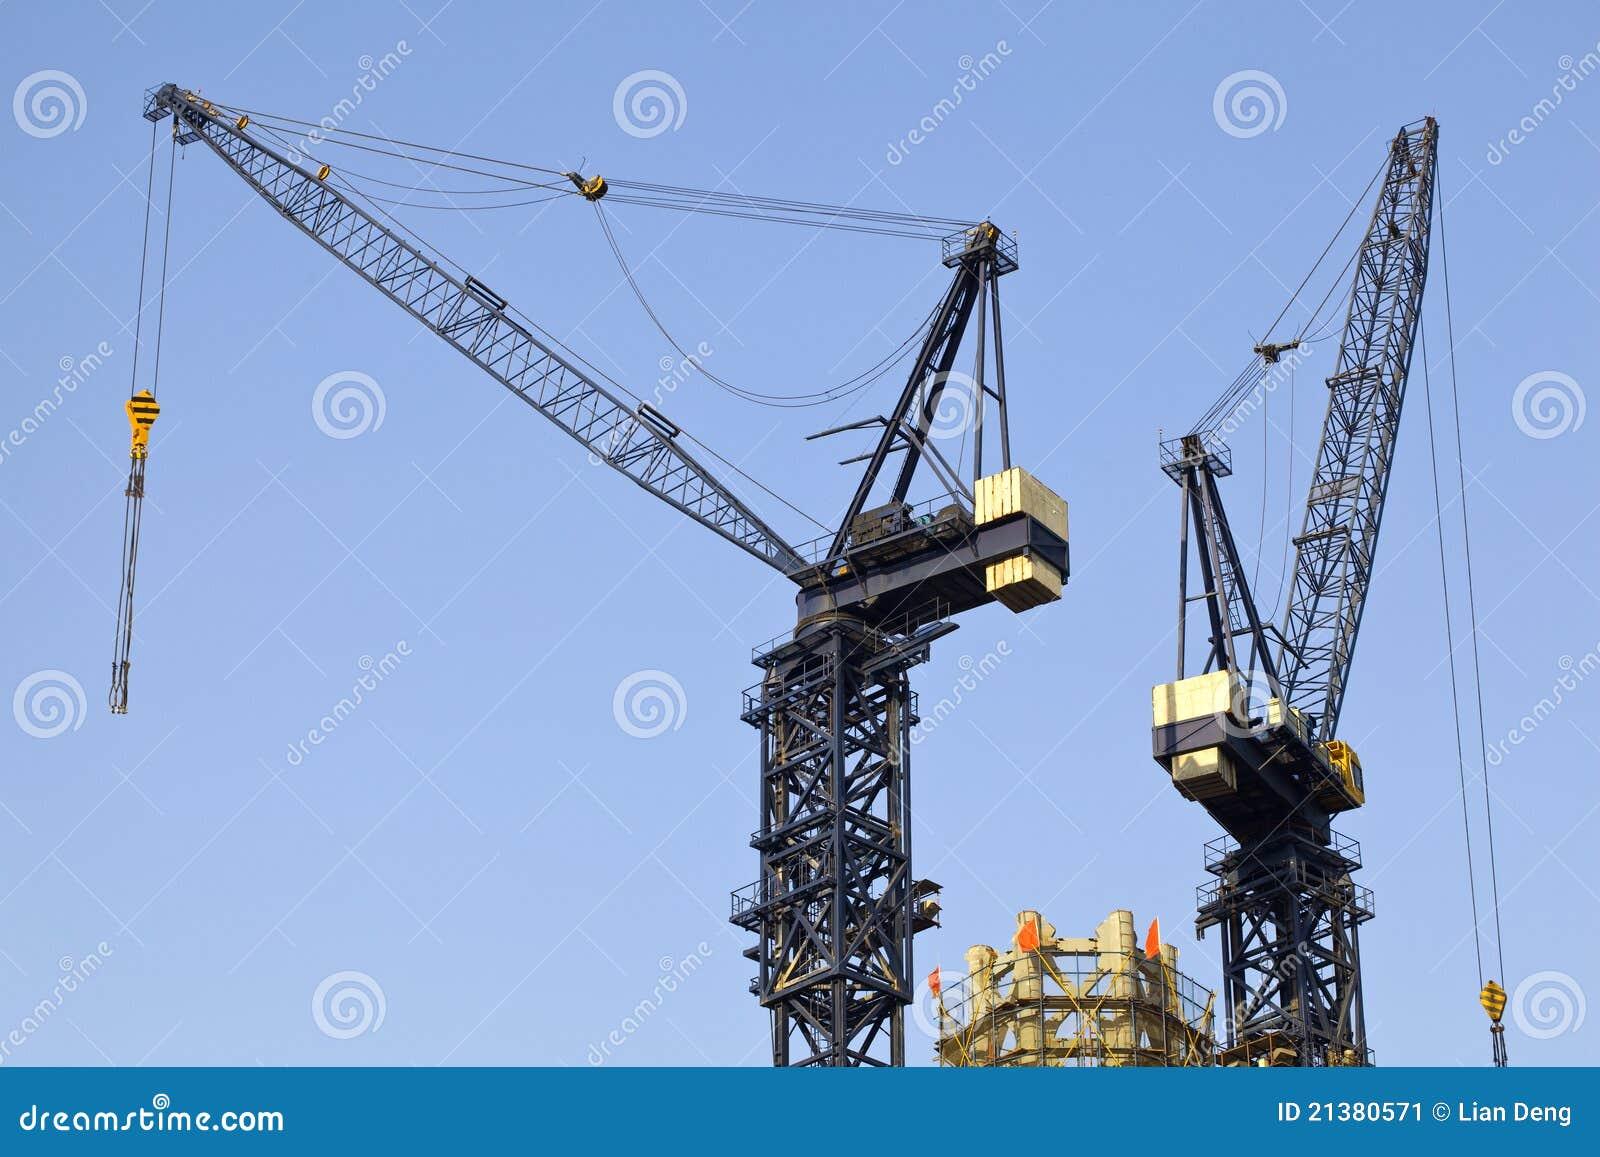 crane machine